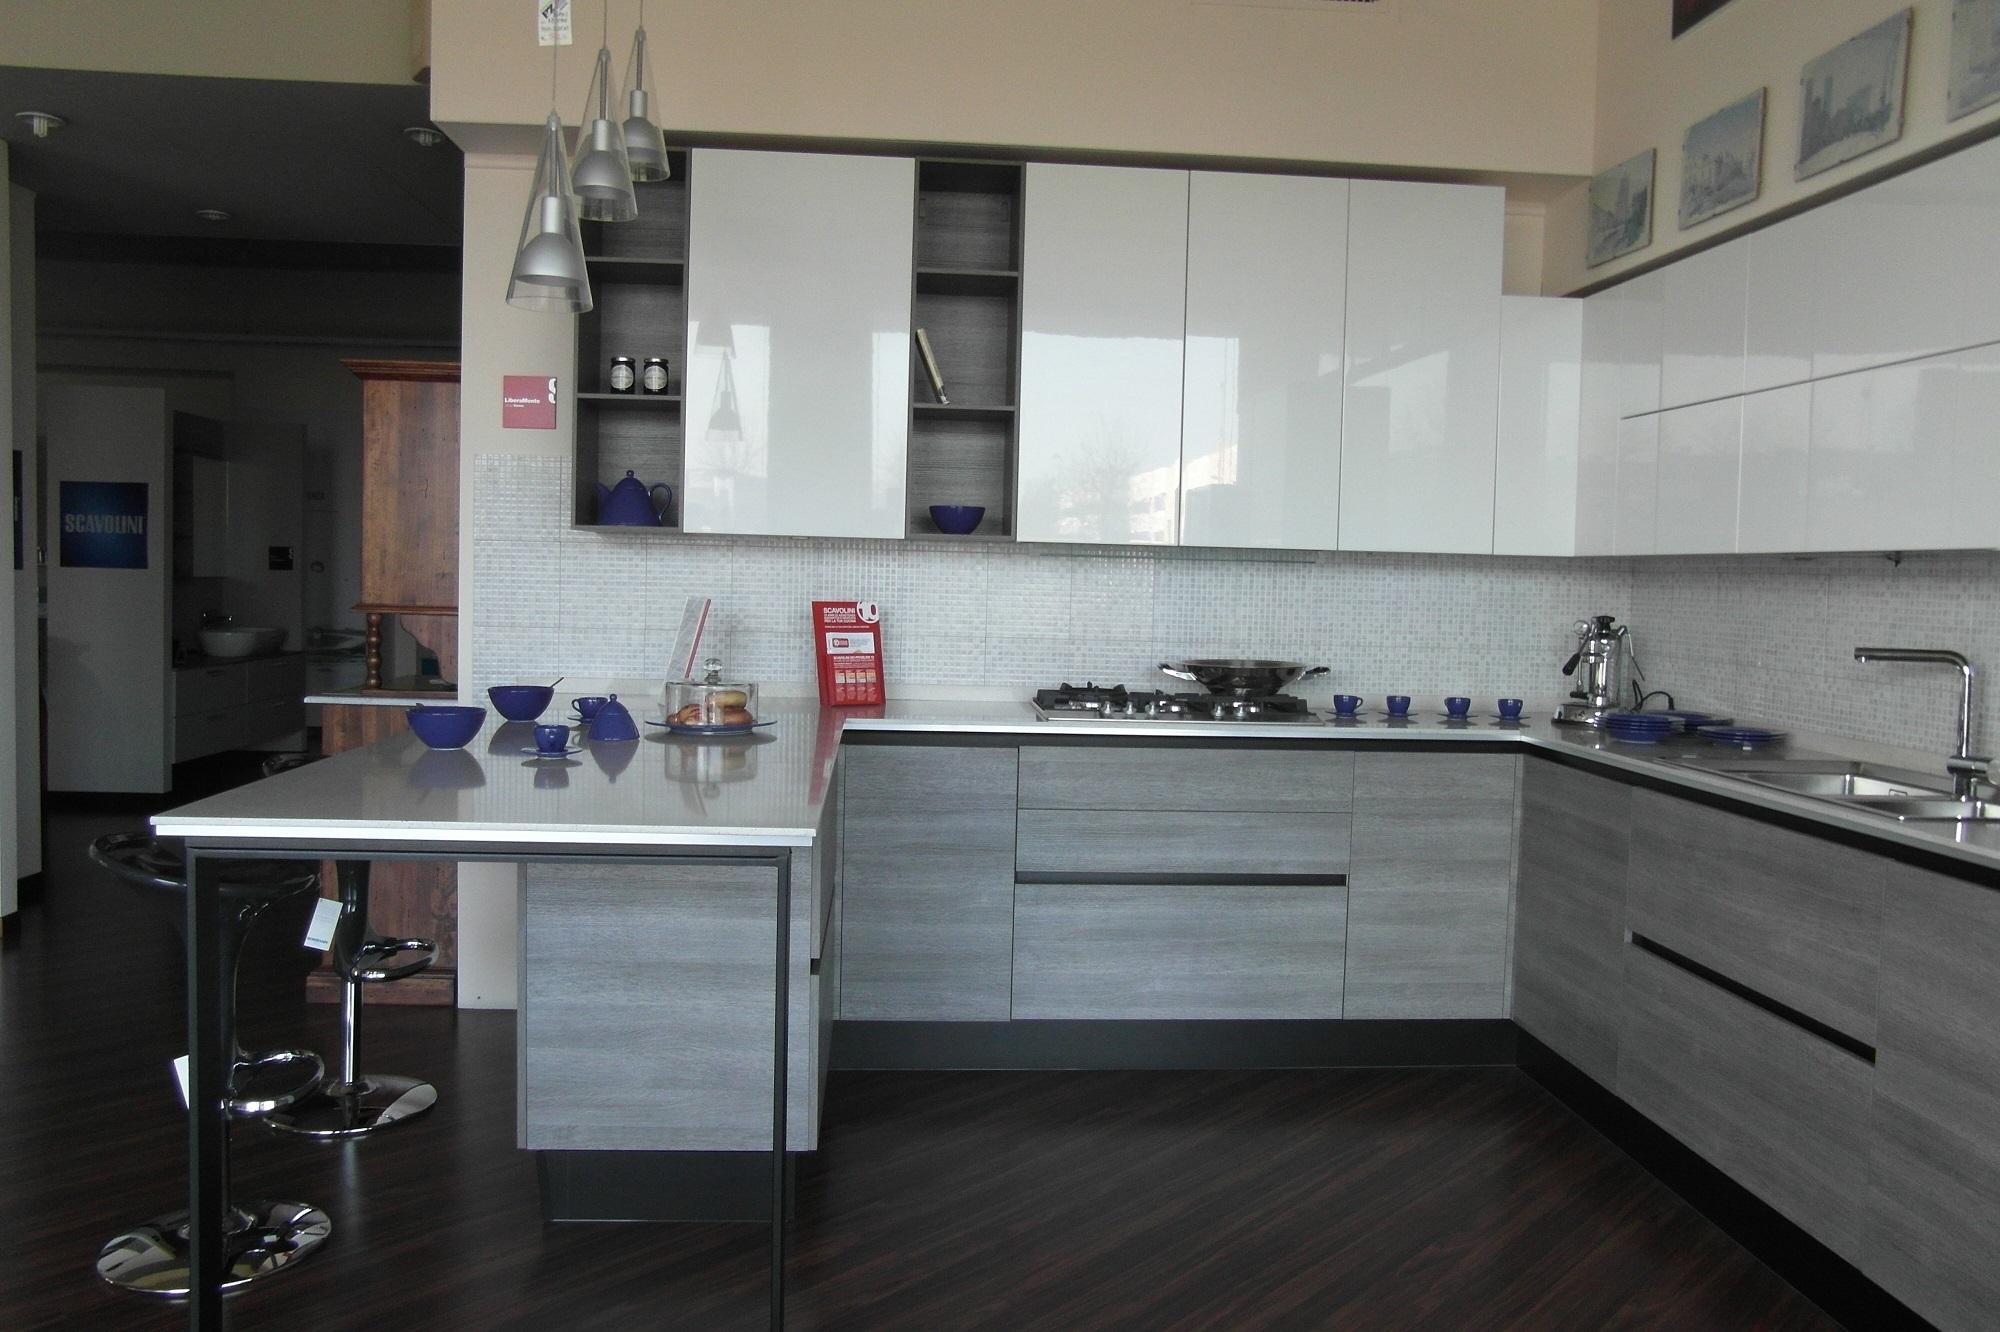 Cucina moderna scavolini arredamento cucina moderna - Arredamento cucina moderna ...